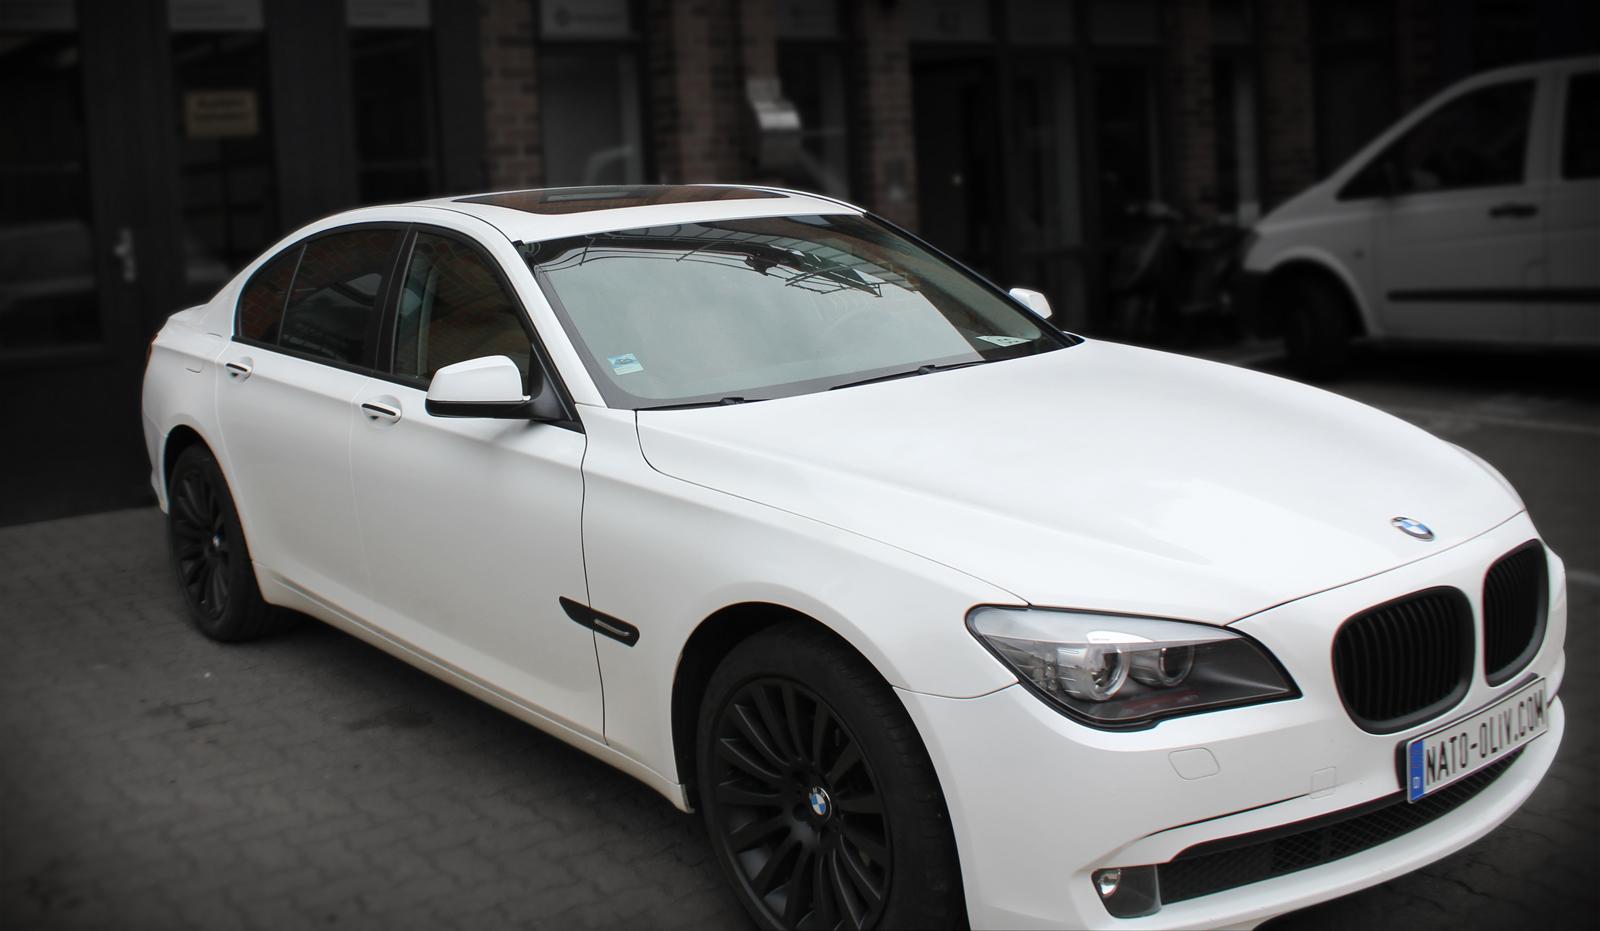 BMW_7er_WEISS_GLANZ_FELGEN_FOLIERUNG_SCHWARZ_MATT_TITELBILD